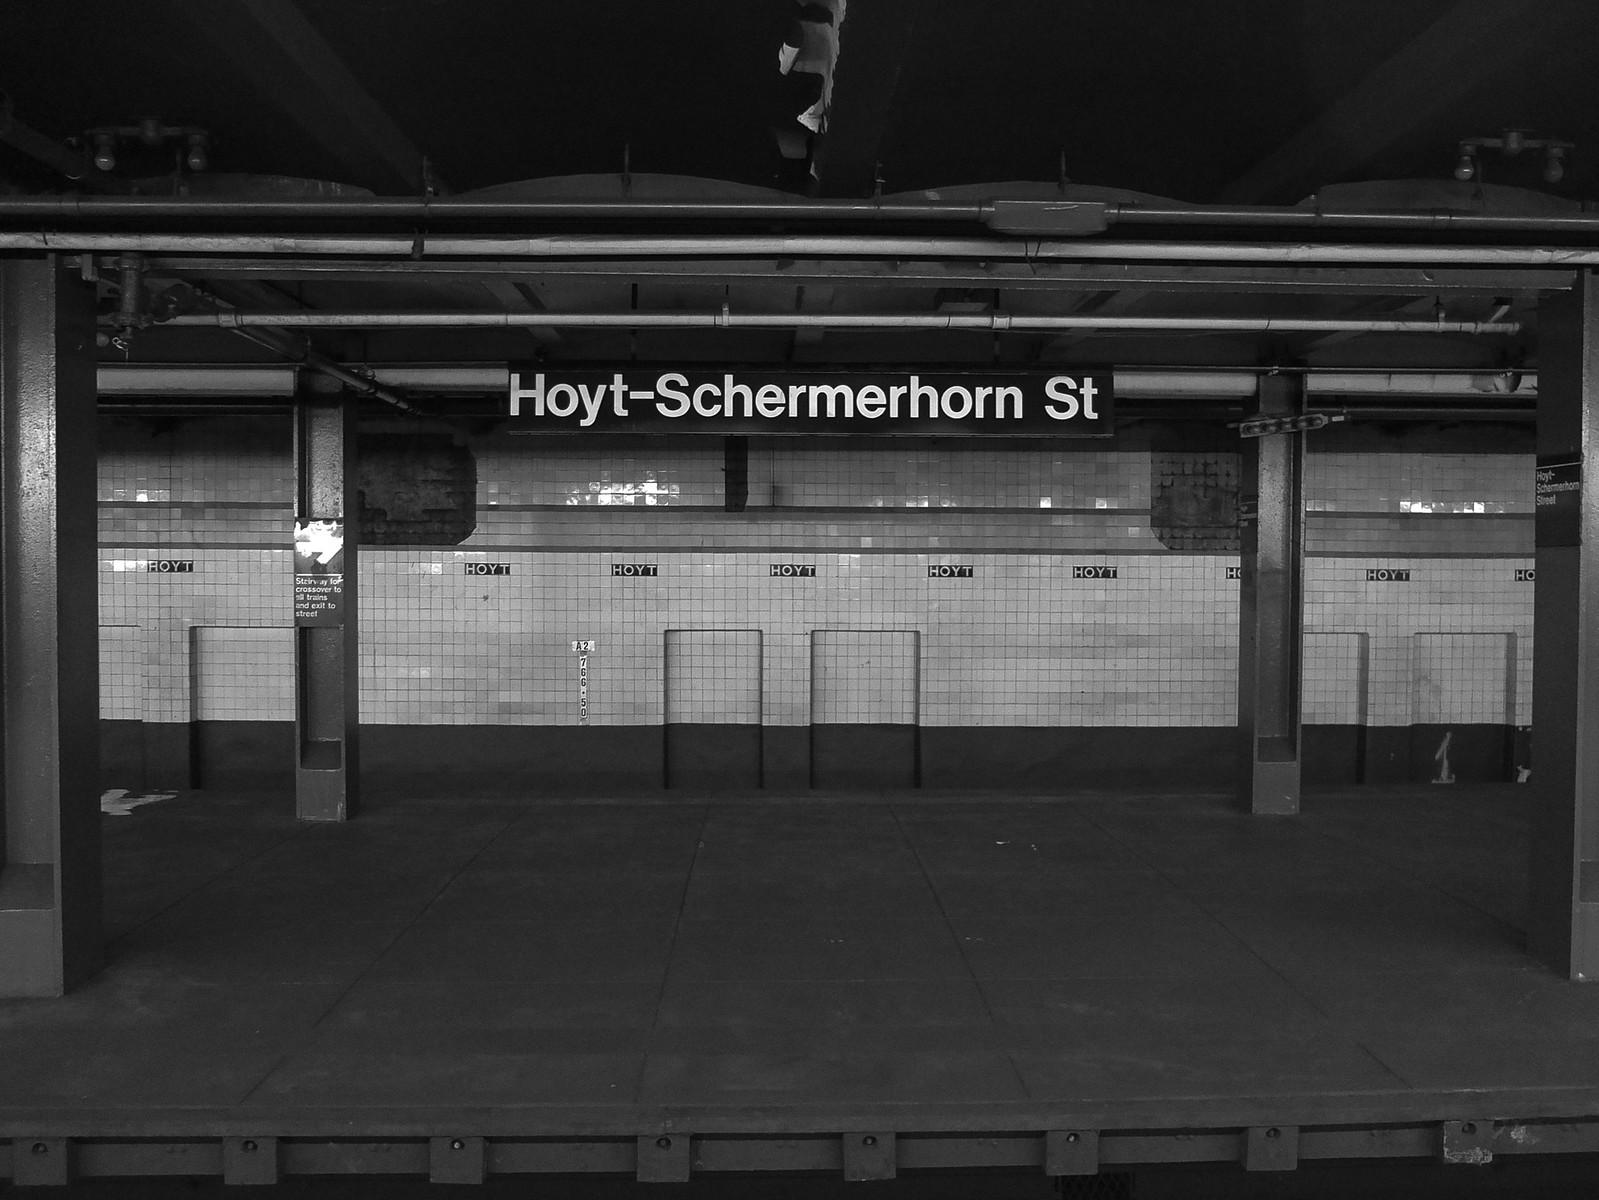 Hoyt-Schermerhorn by wwward0